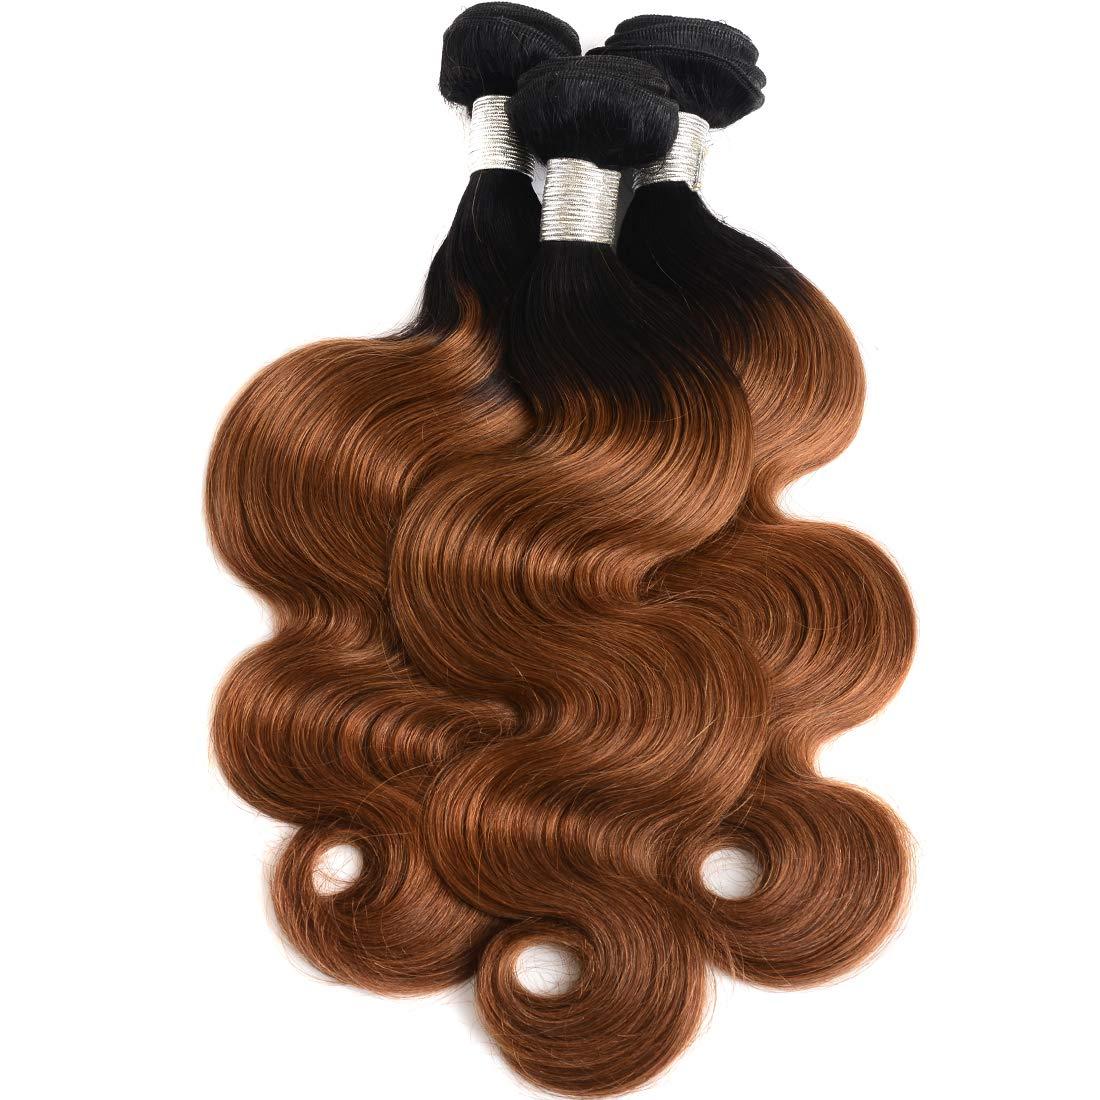 AUTTO Ombre Brazilian 即納送料無料! 当店一番人気 Hair 3 Body Wave Bundles